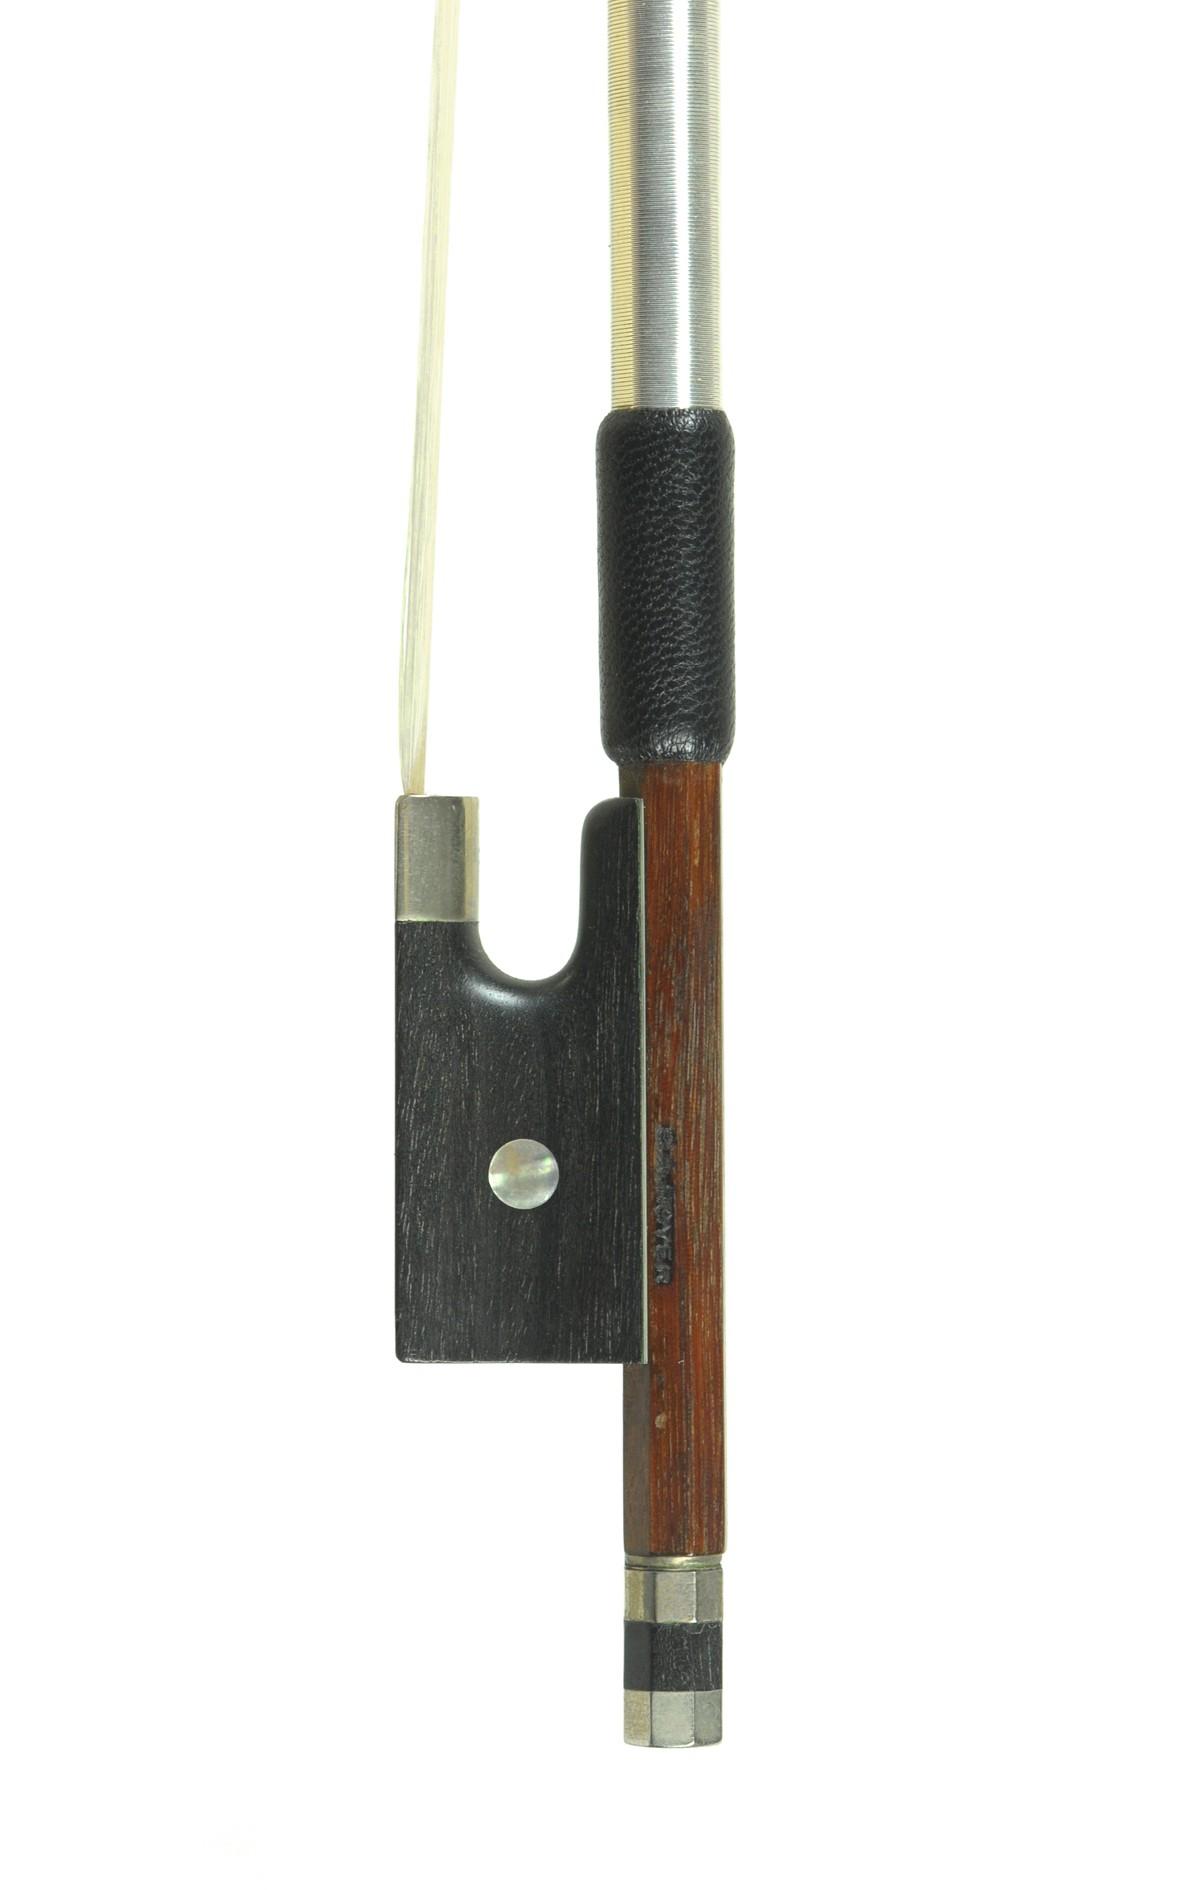 C. A. Hoyer violin bow